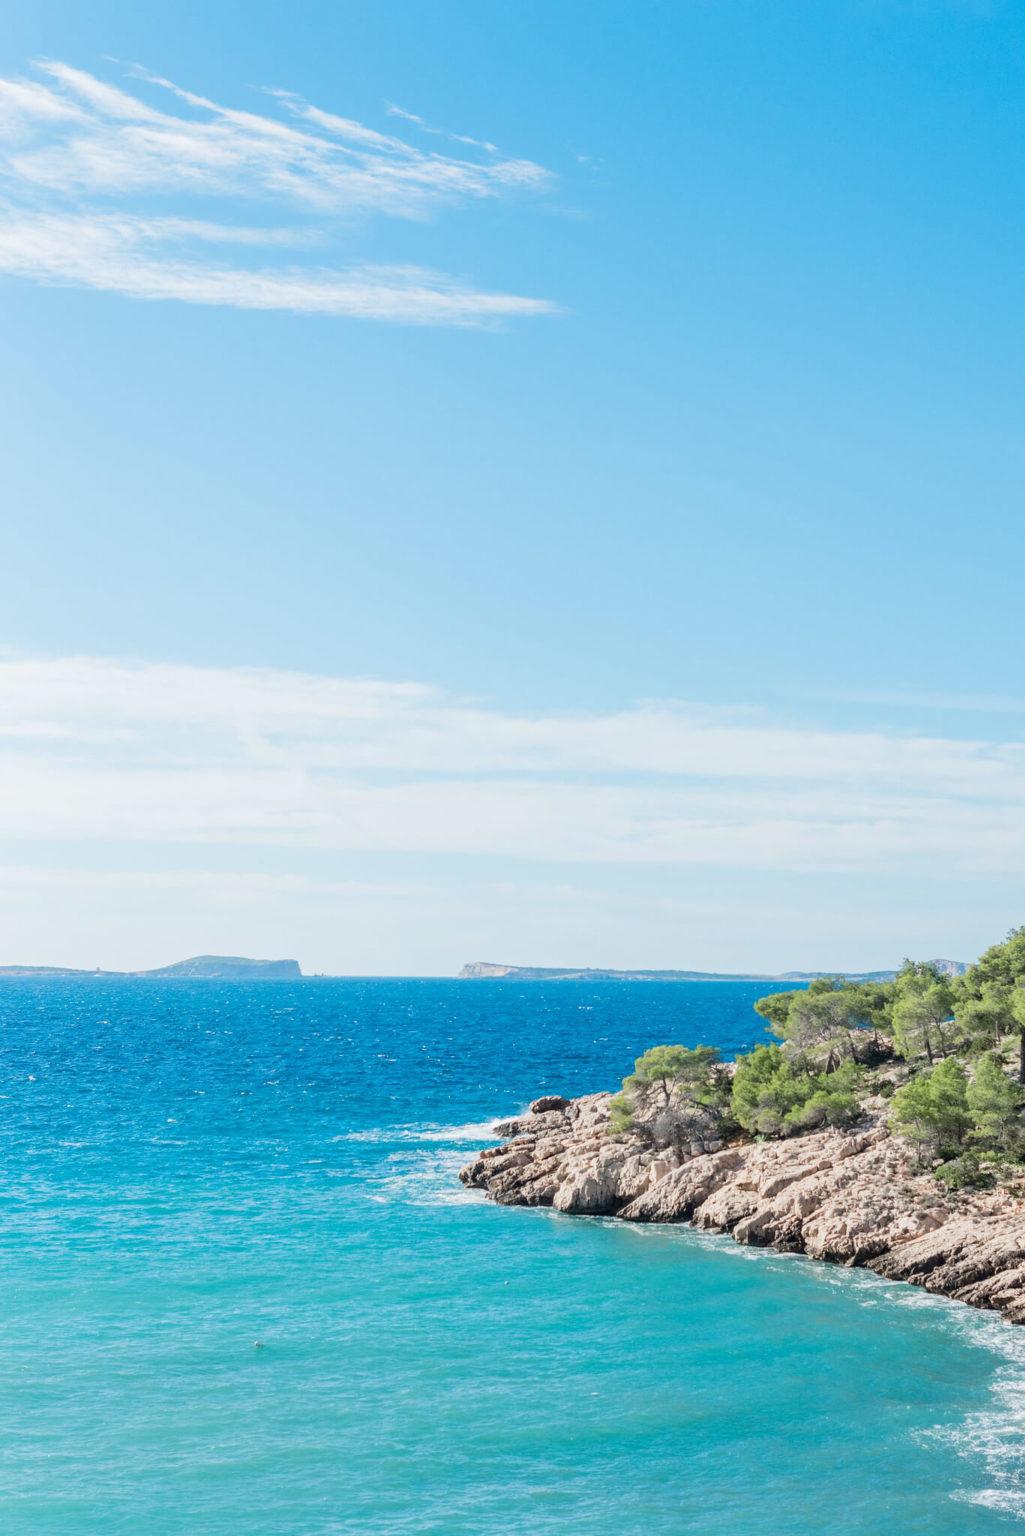 https://www.white-ibiza.com/wp-content/uploads/2020/03/ibiza-beaches-cala-saladeta-06-1025x1536.jpg